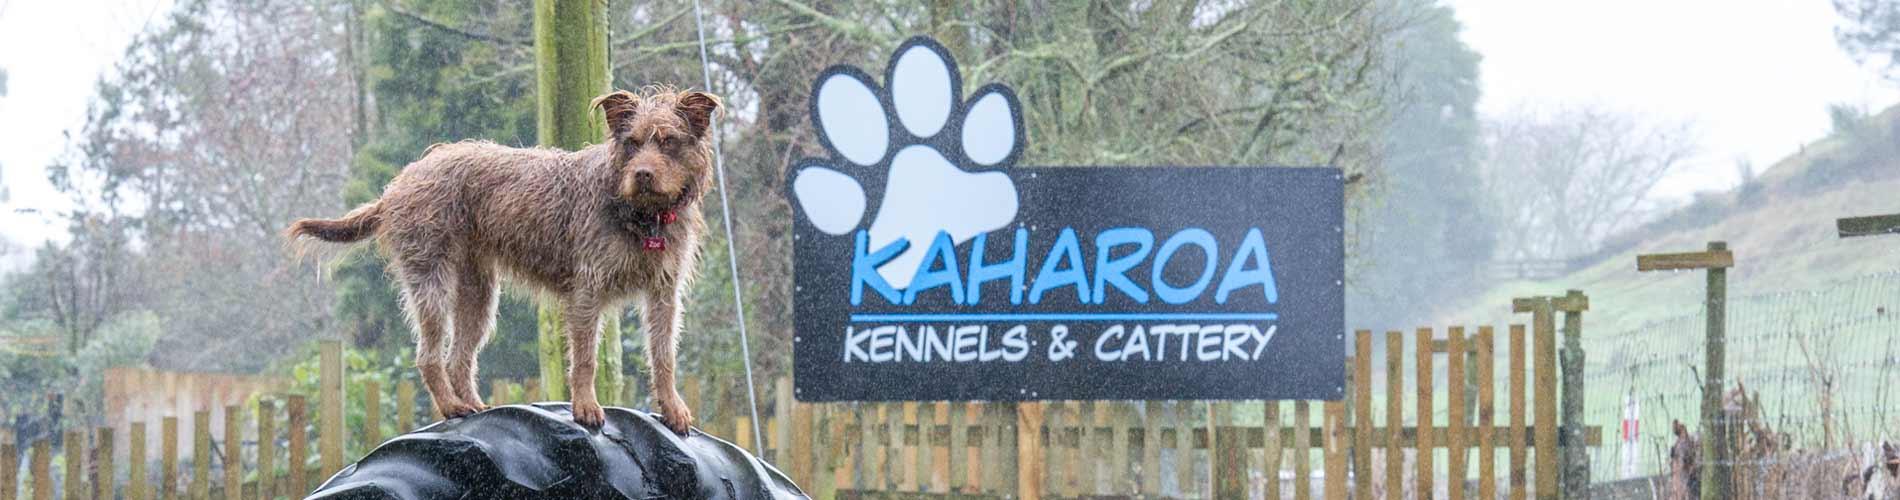 Doggy Daystays - kaharoa kennels